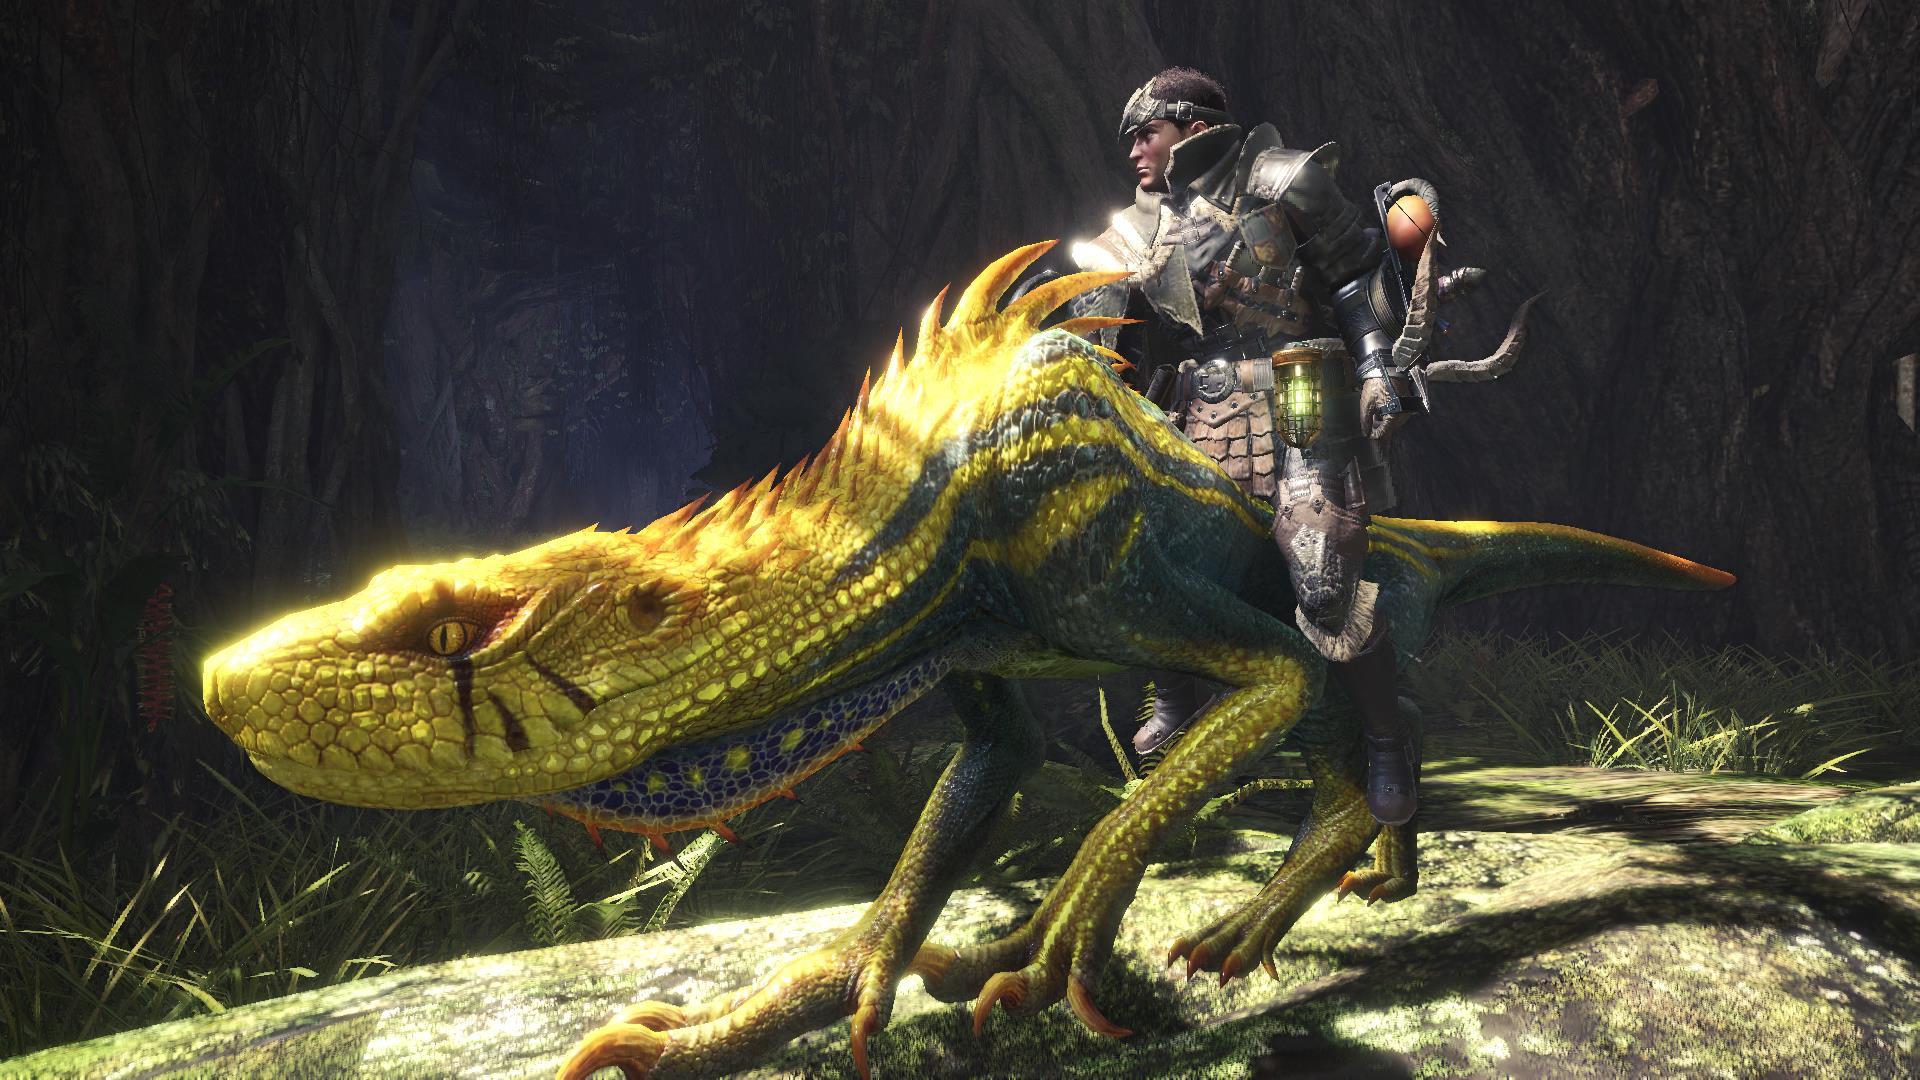 Monster Hunter World: Iceborne release date – all the latest details